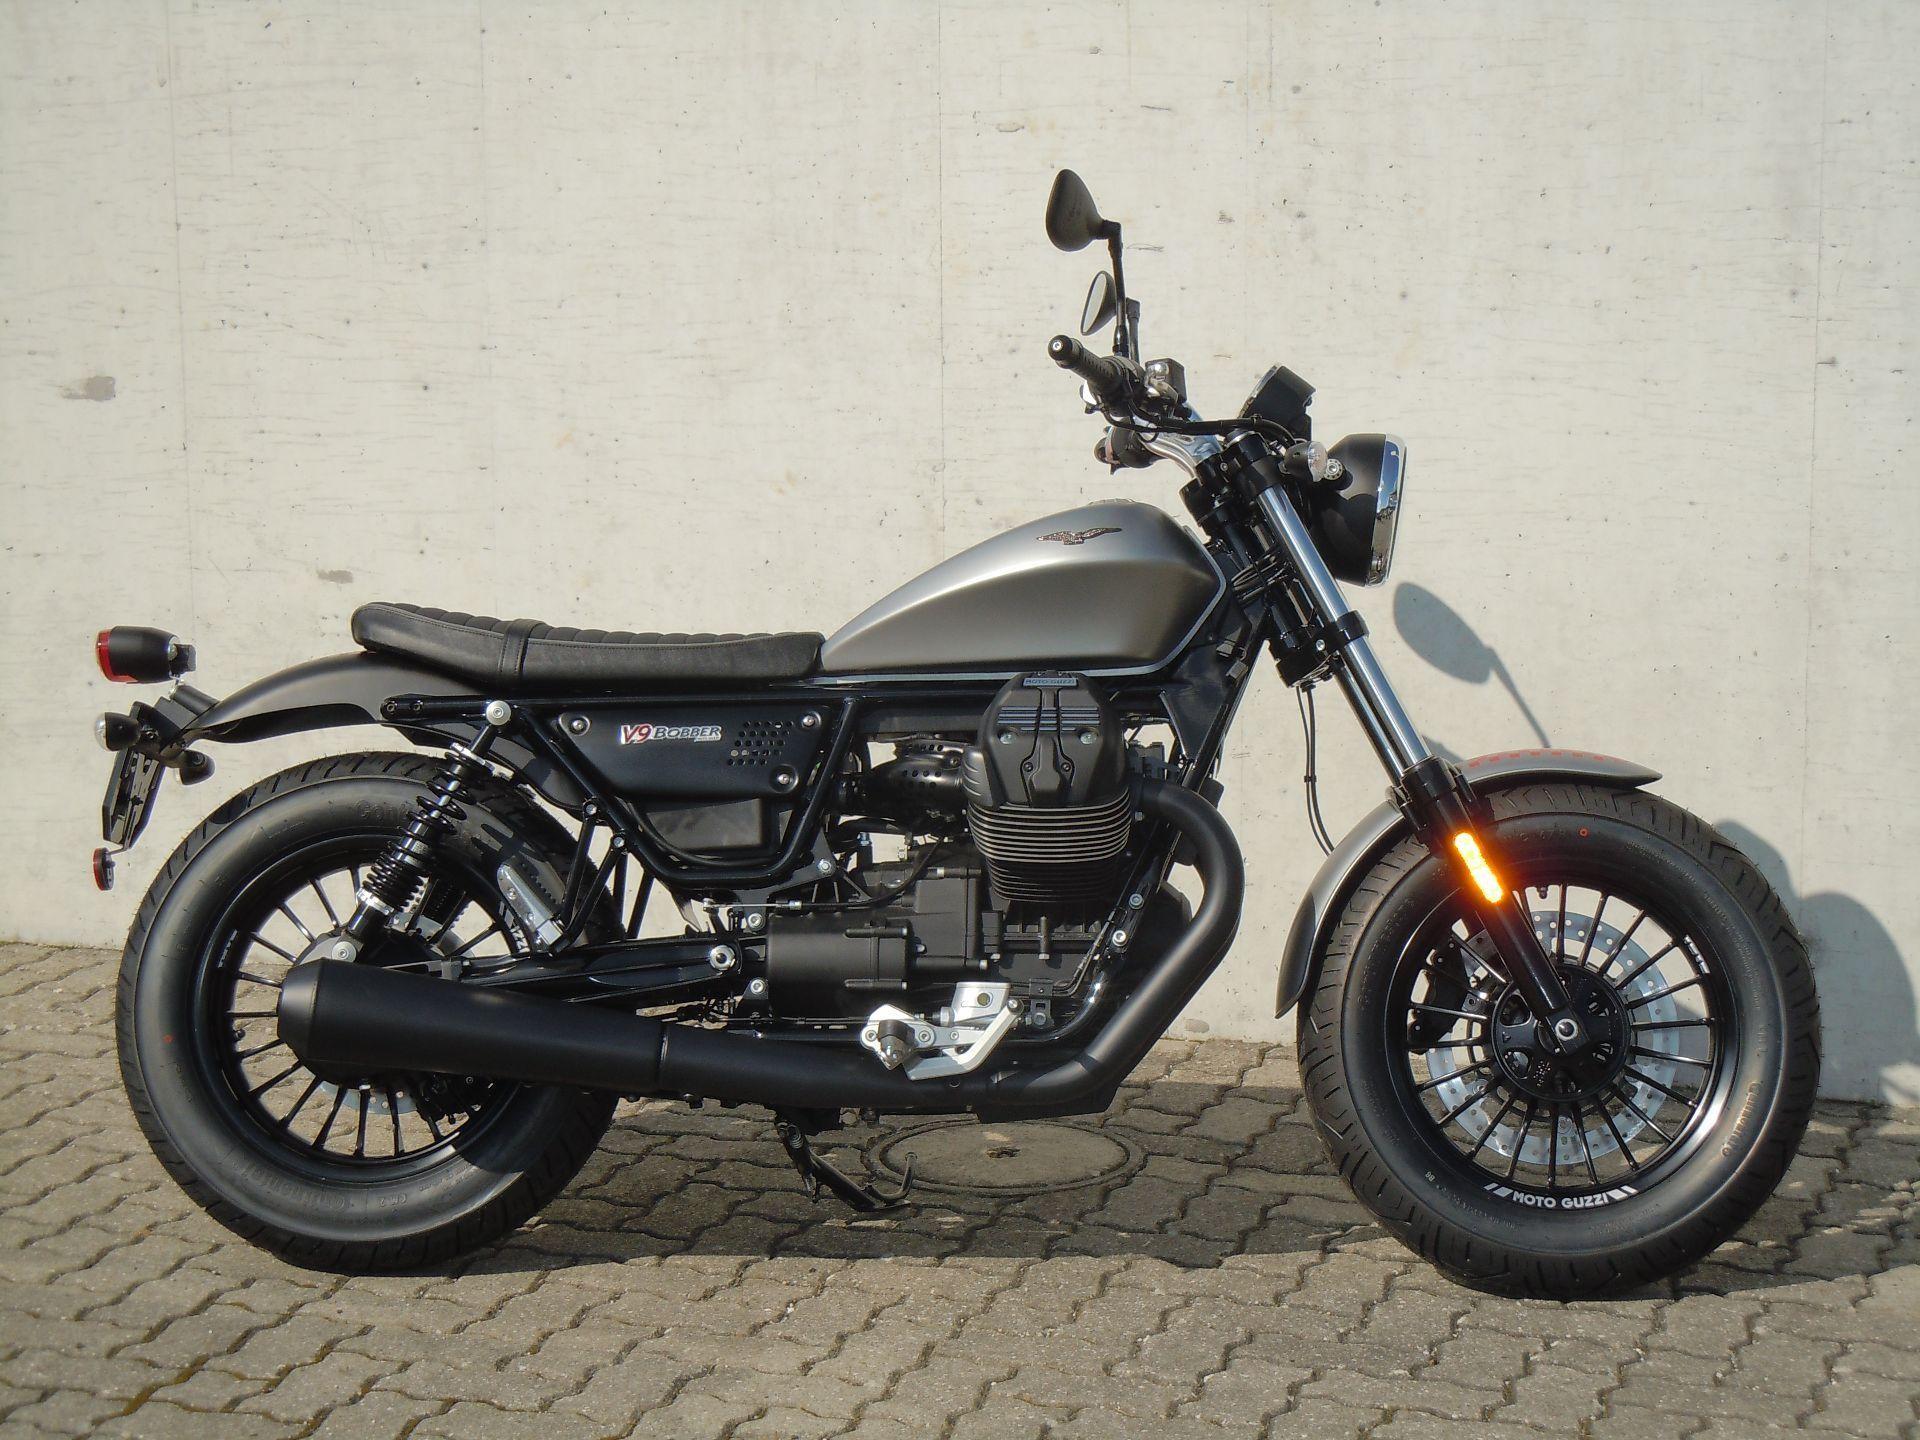 motorrad occasion kaufen moto guzzi v9 bobber abs rolf gall superbikes ag b tzberg. Black Bedroom Furniture Sets. Home Design Ideas